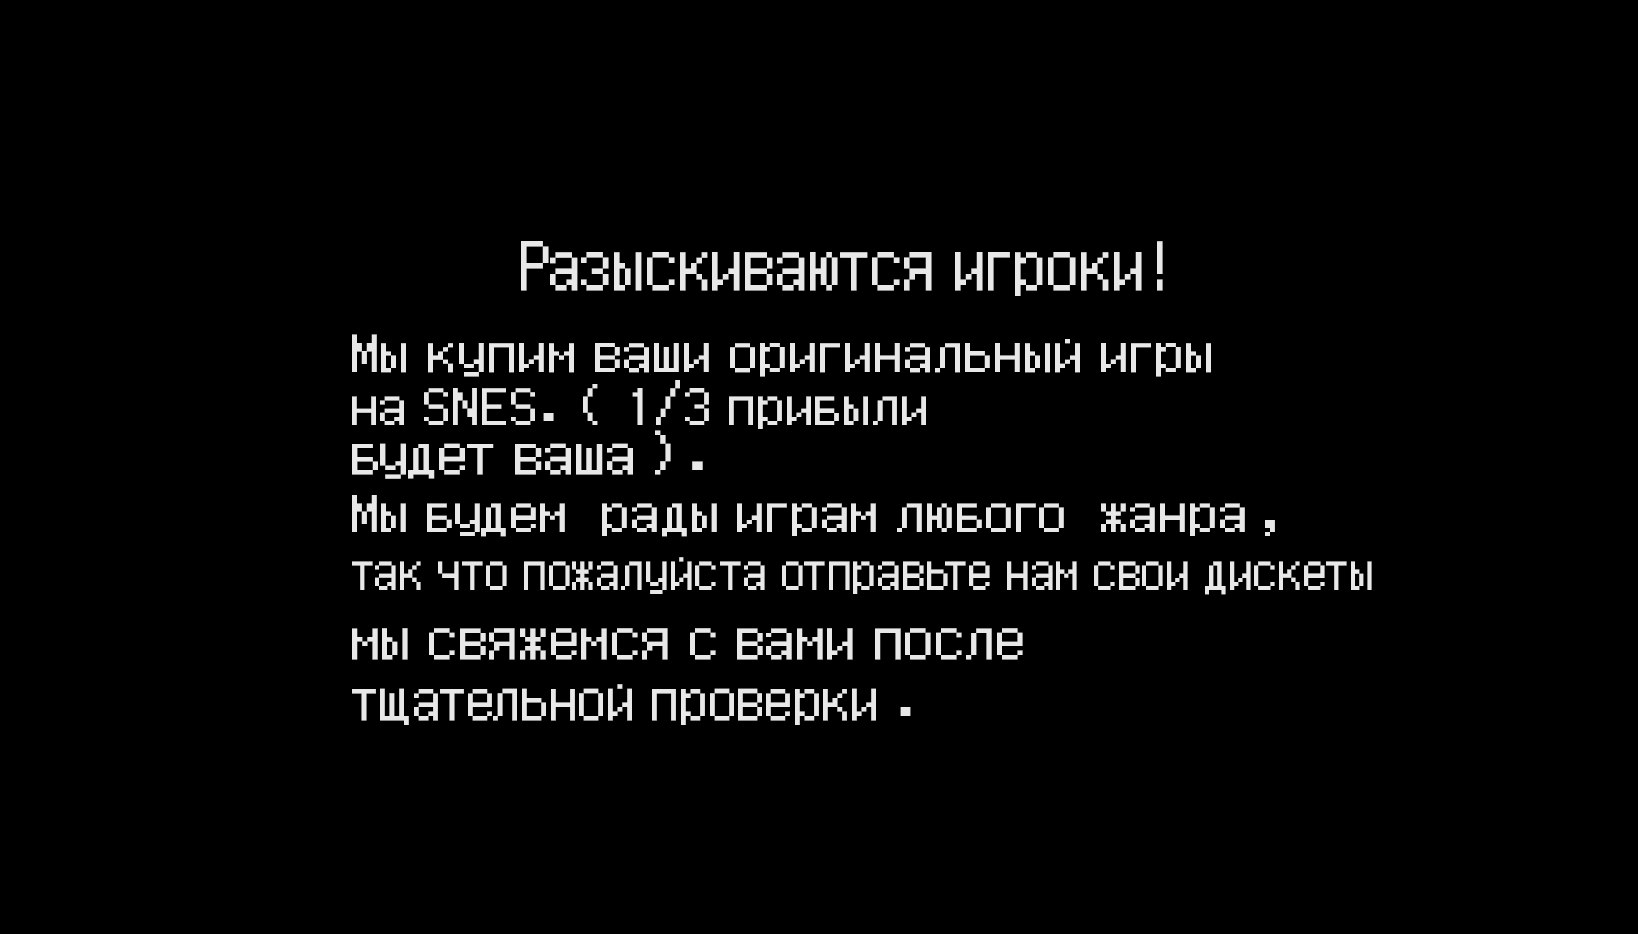 https://pp.userapi.com/c840134/v840134464/26794/5Ph_xWW3rmM.jpg